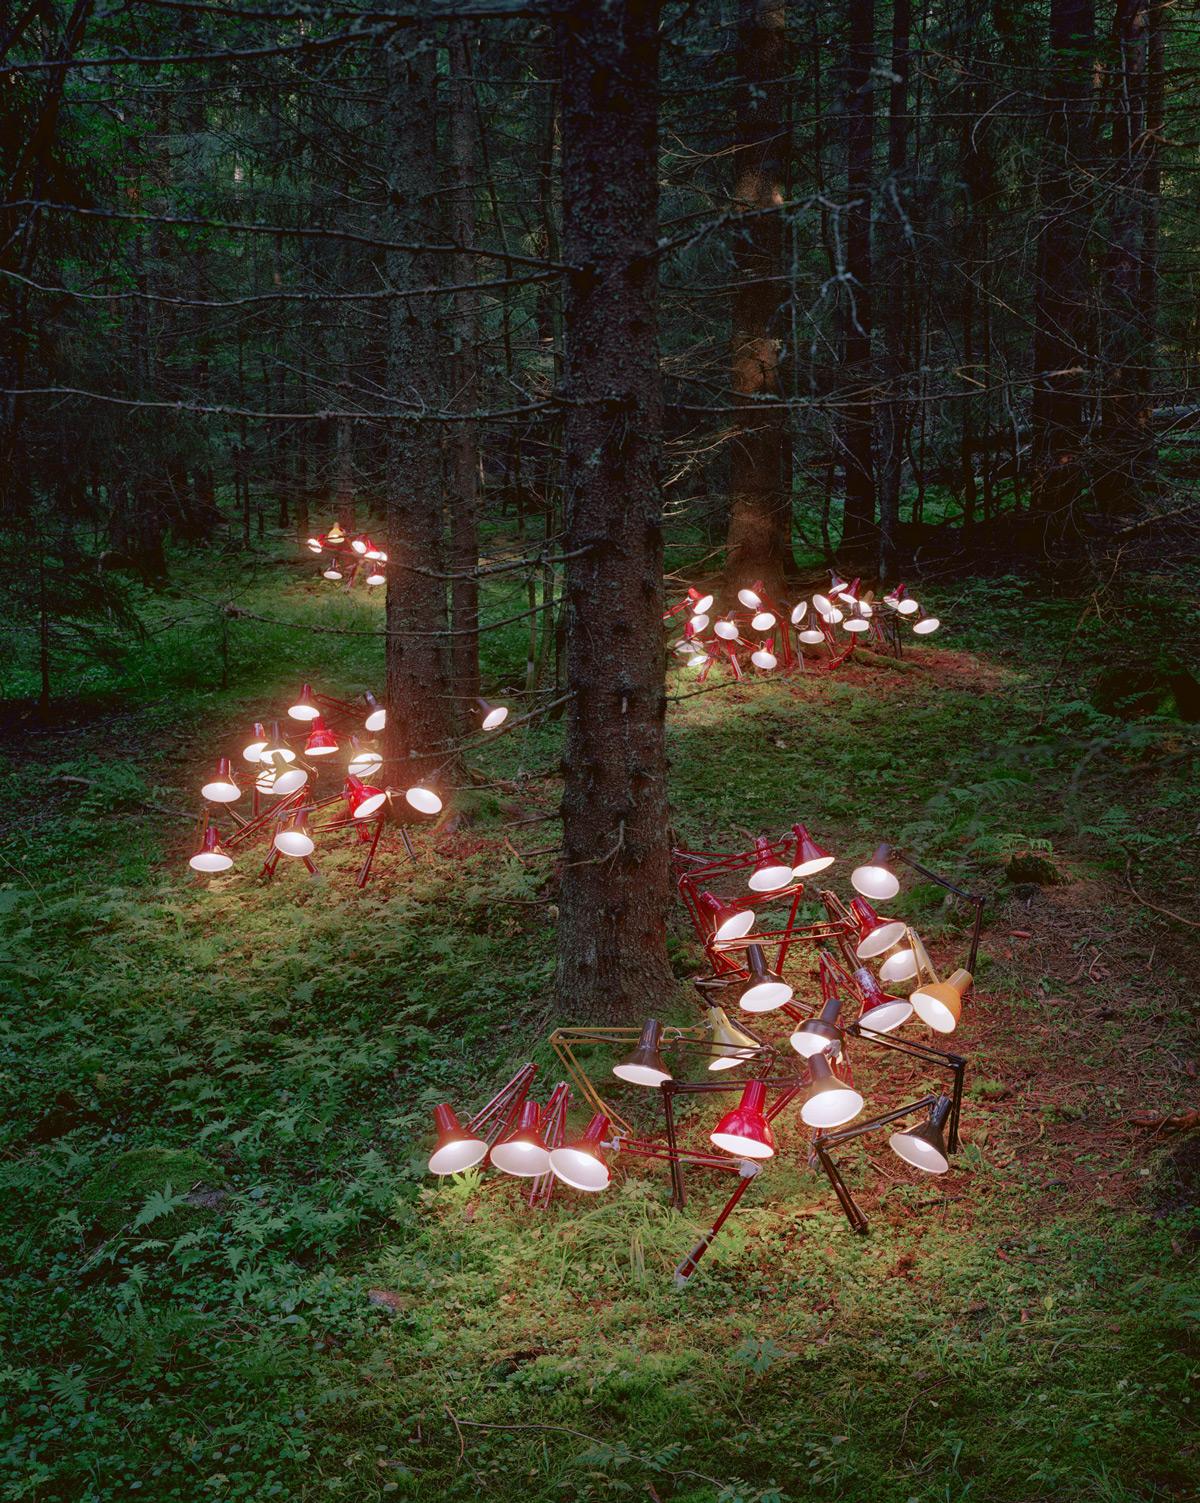 Wonderful surrealist art installations by Rune Guneriussen in his native Norway.